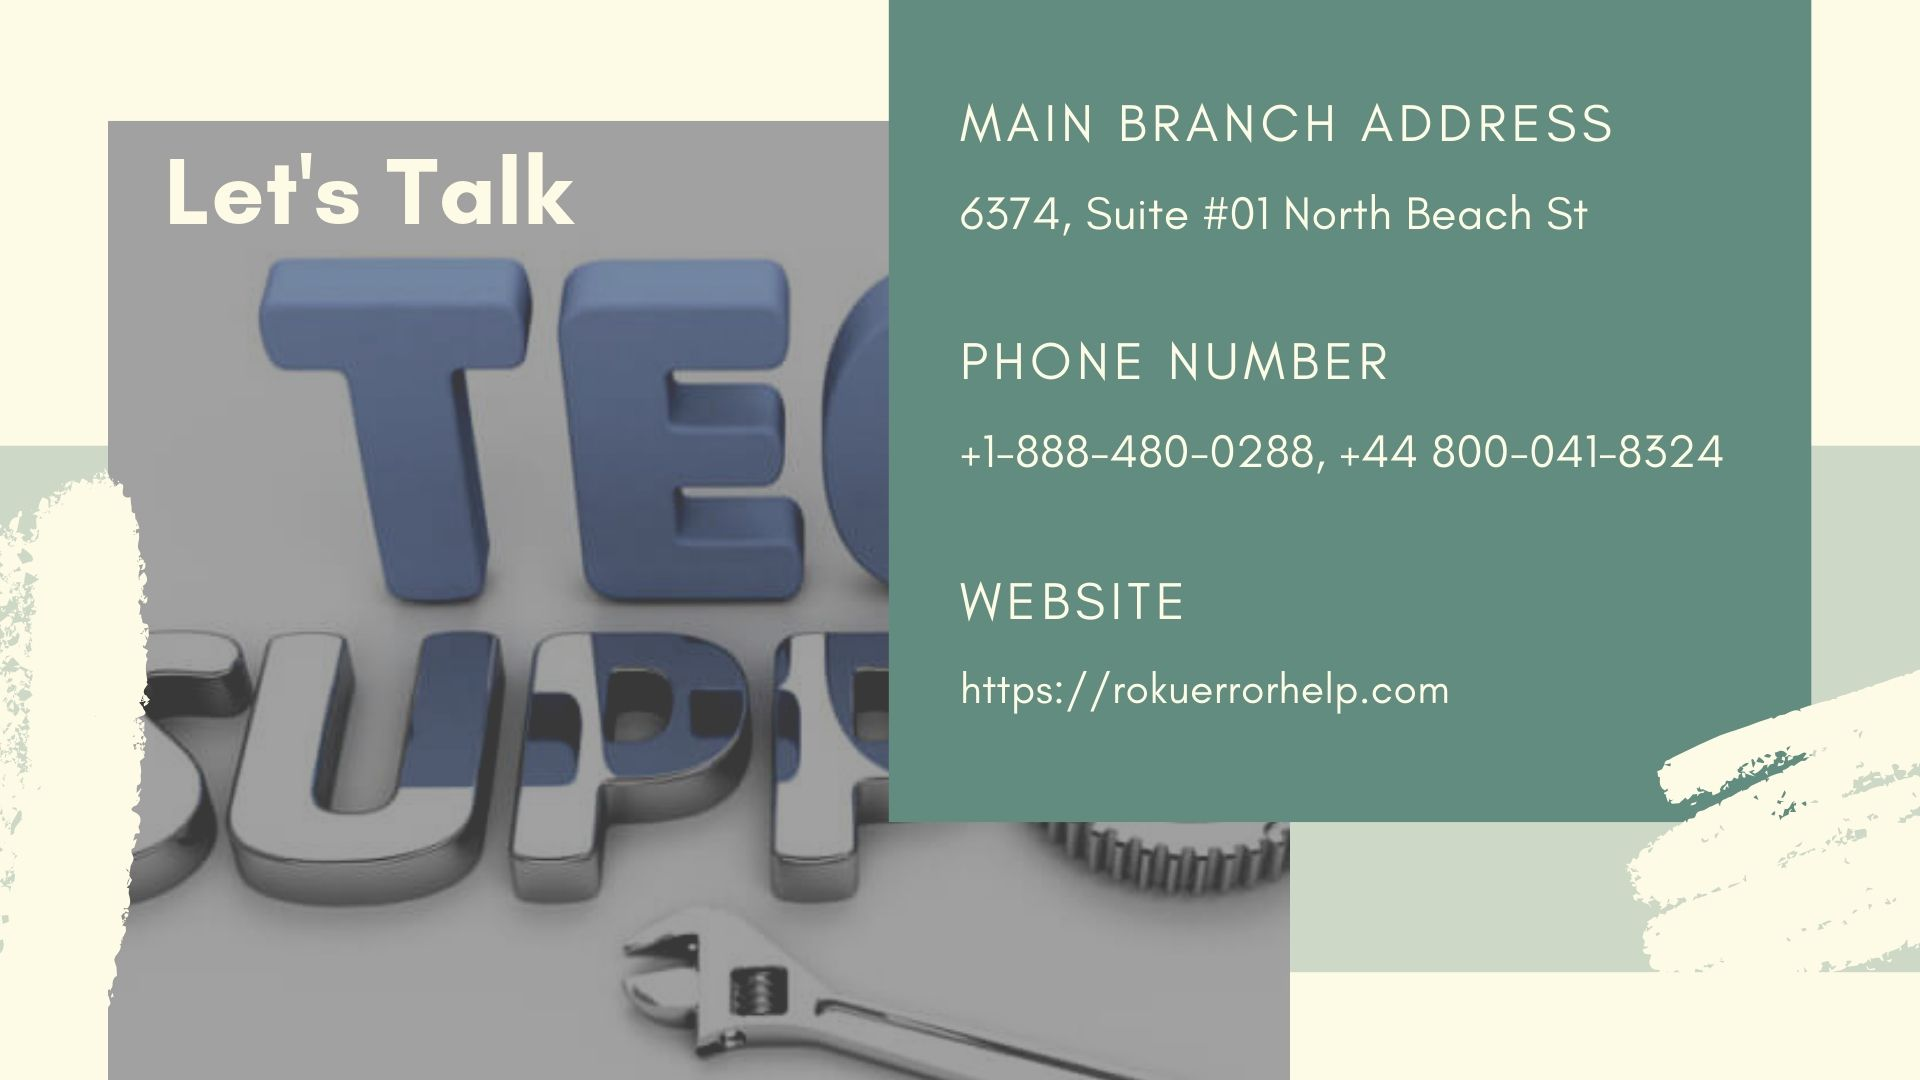 Facing Roku error codes? Don't fret Roku Helpline are